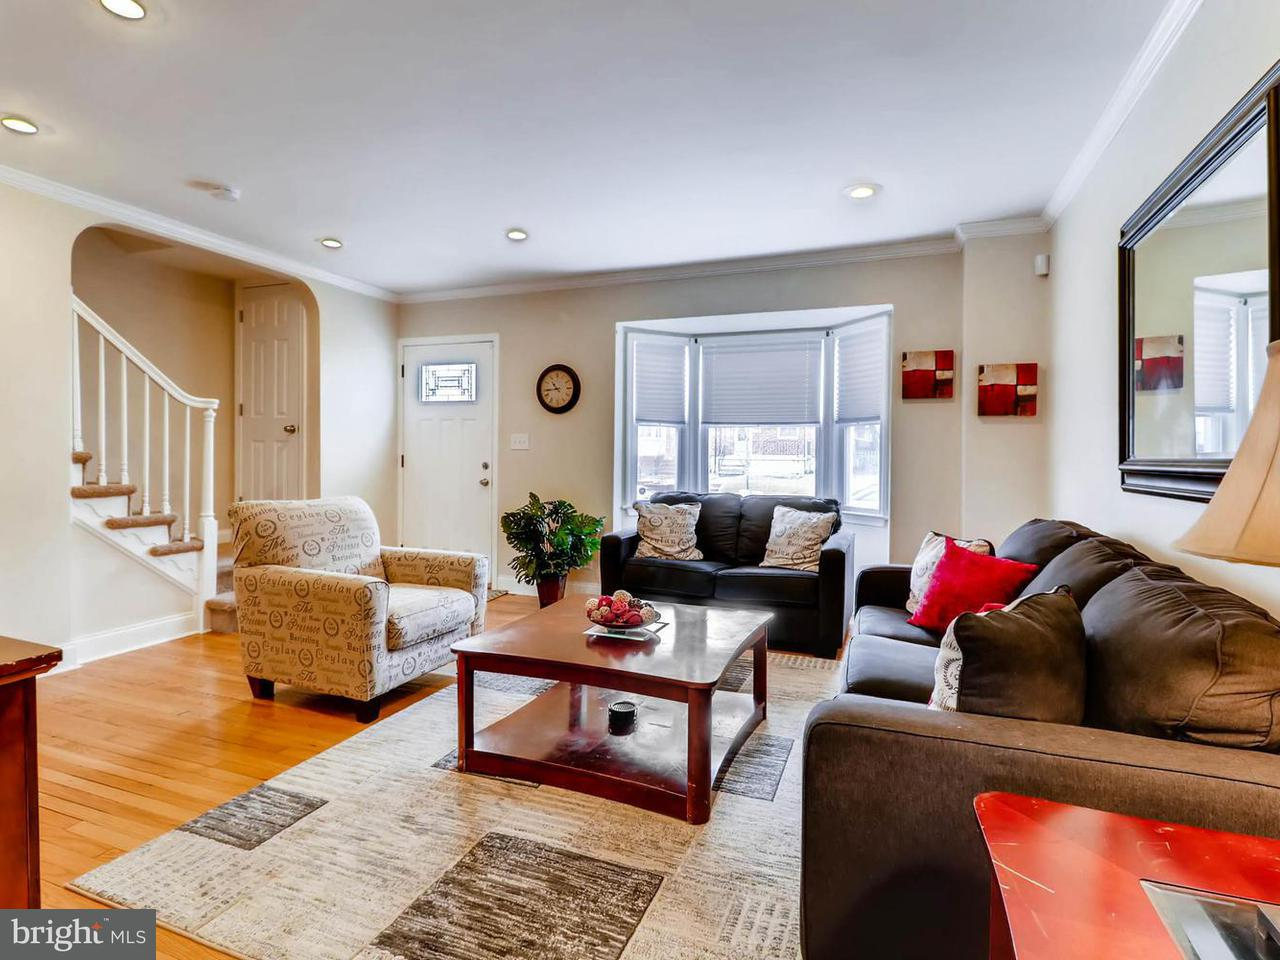 Single Family for Sale at 1213 Evesham Ave Baltimore, Maryland 21239 United States